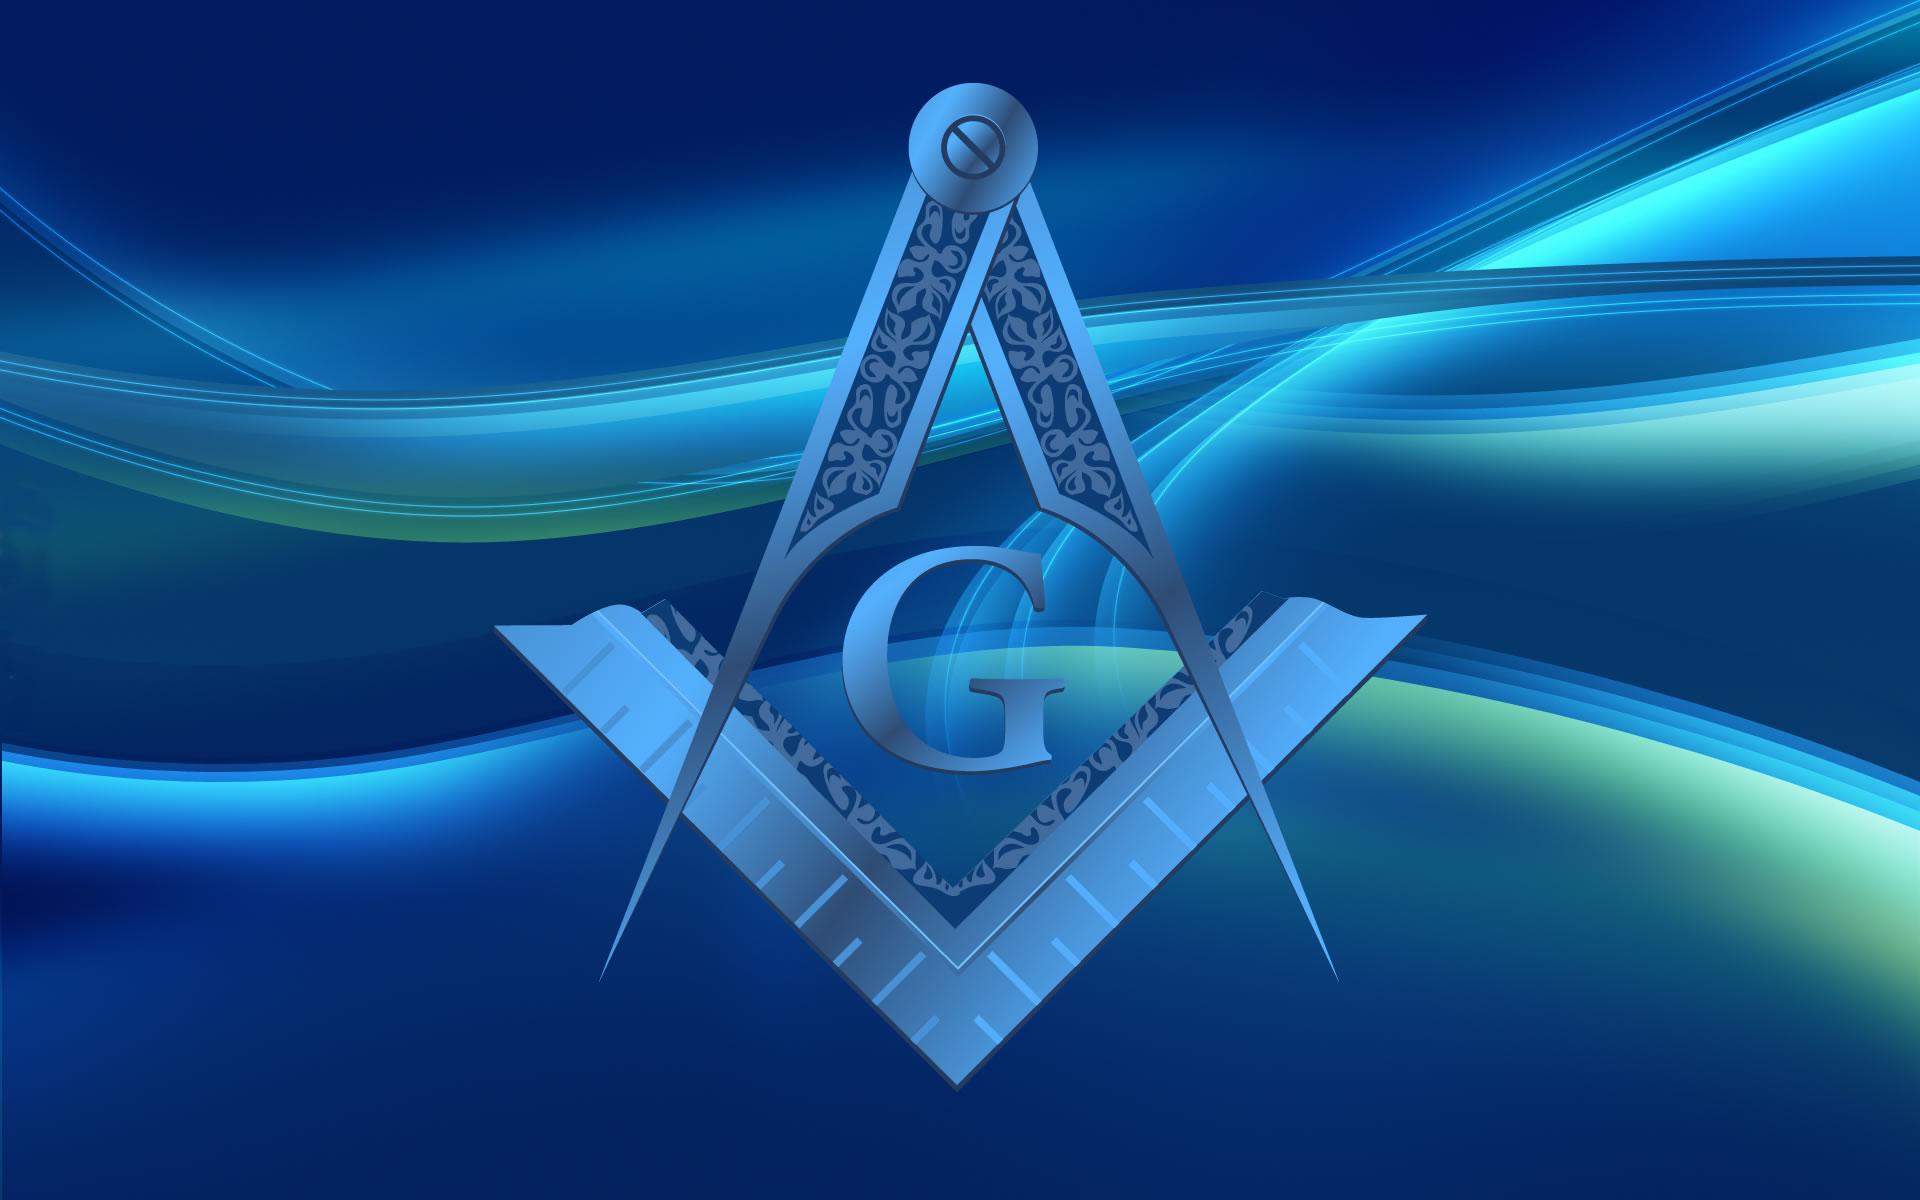 freemason-292